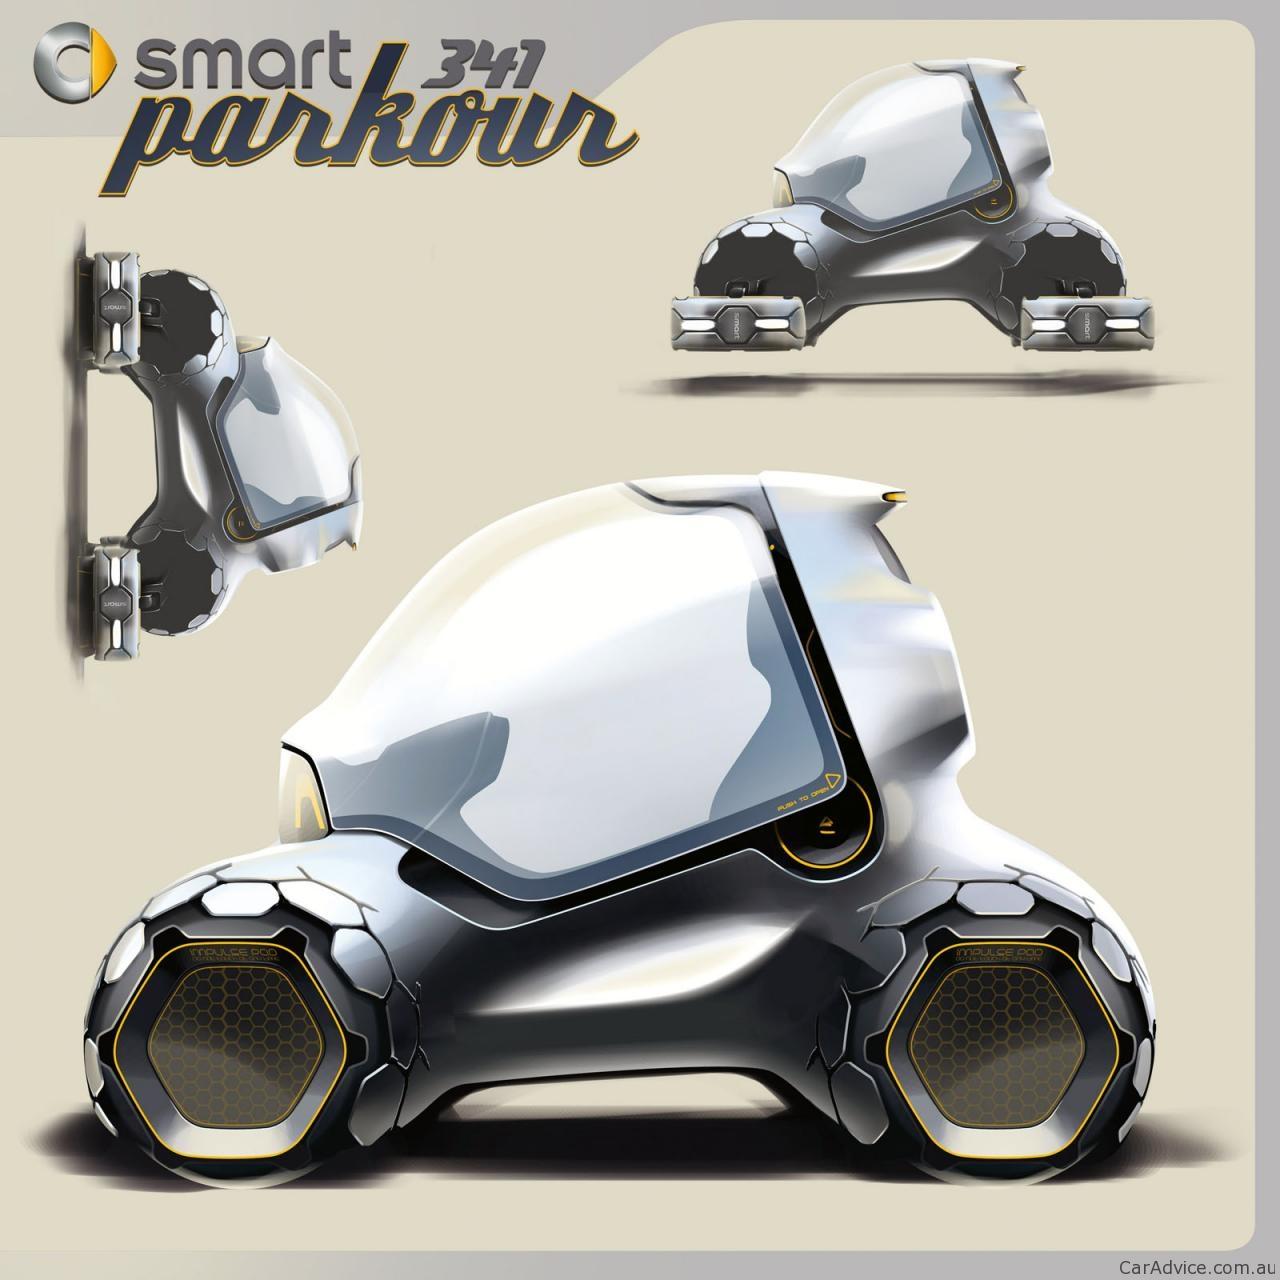 Hollywood's Future Cars: Los Angeles Auto Show Design